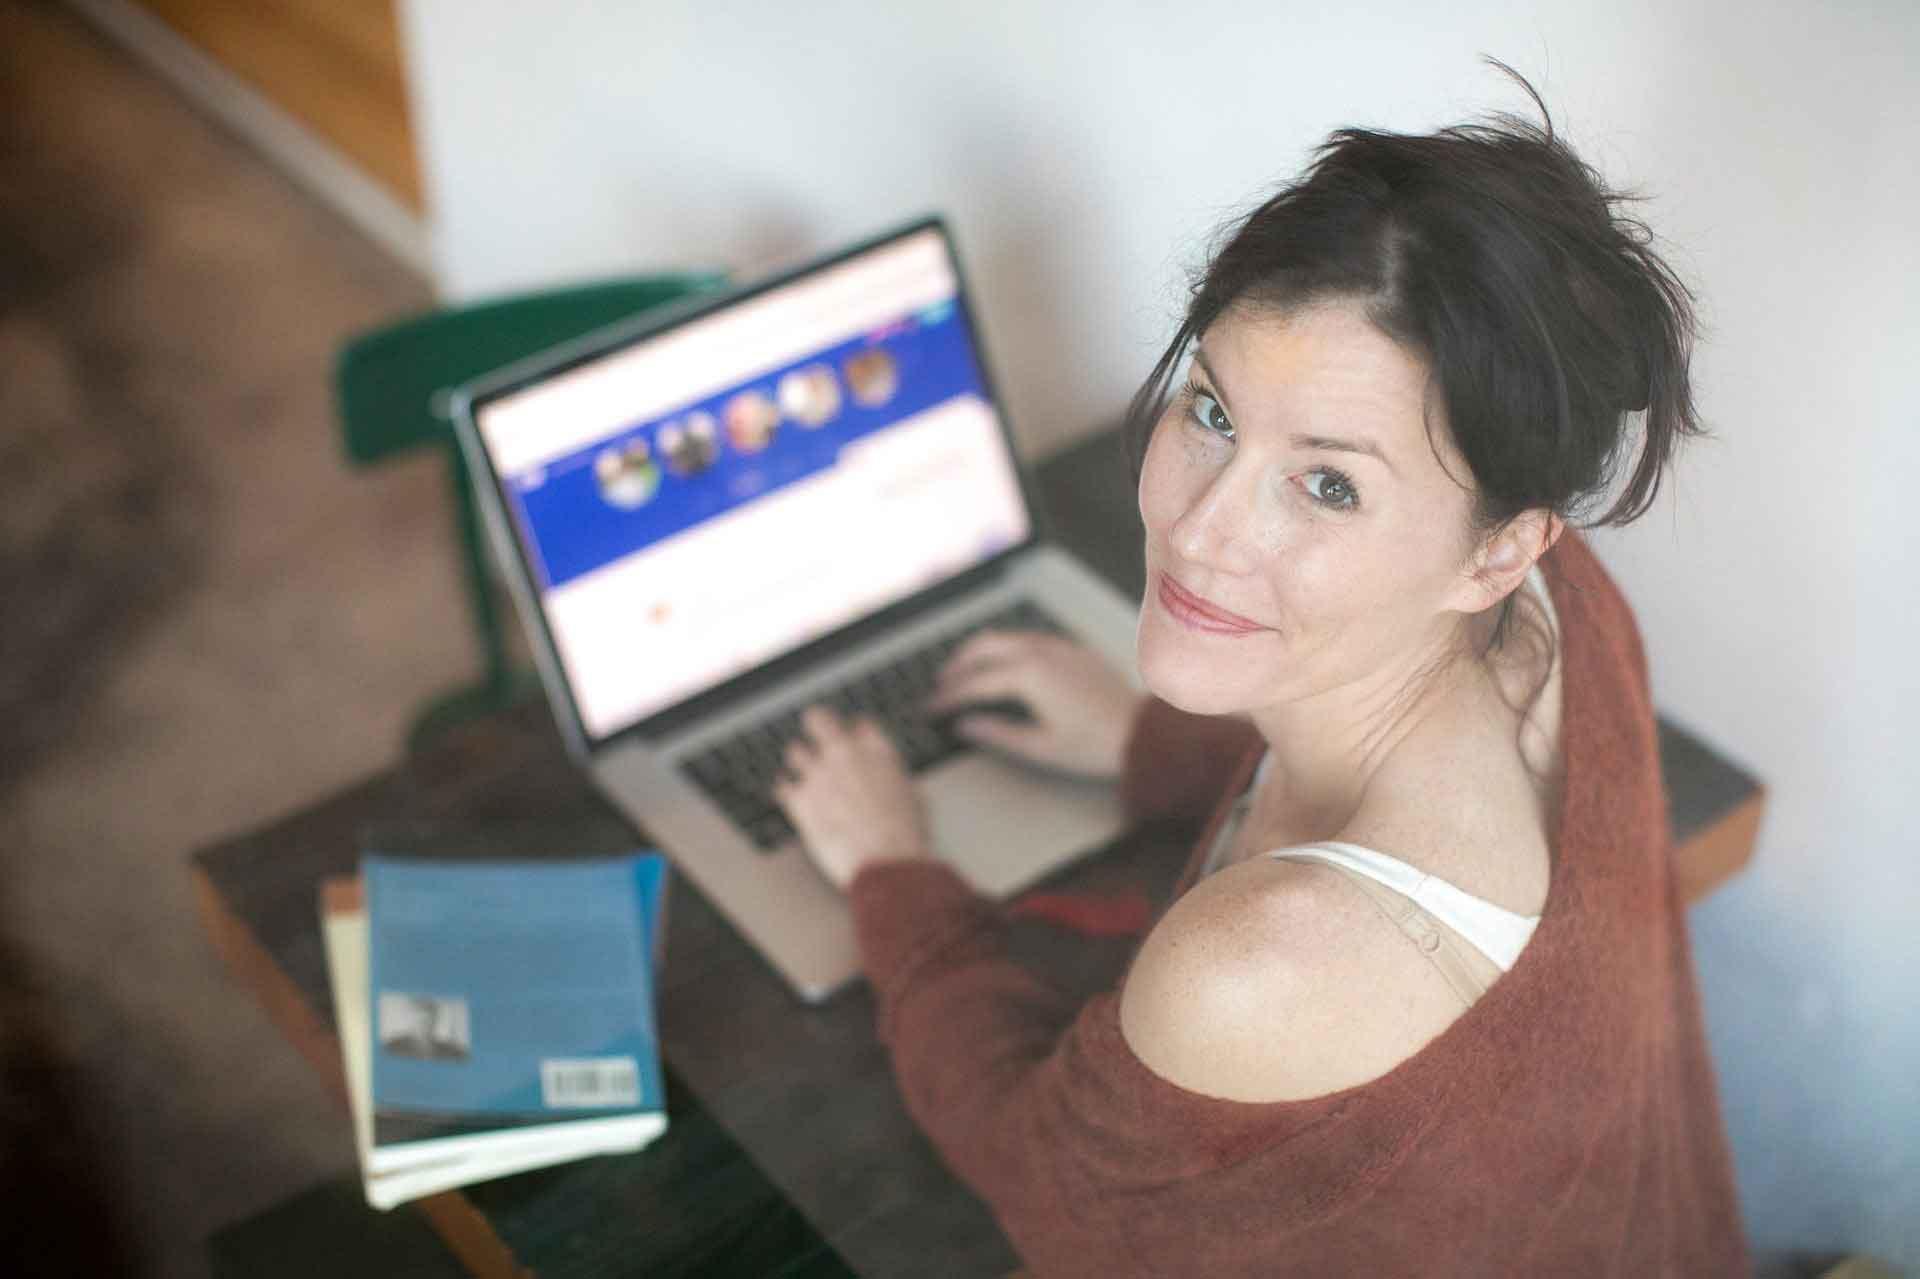 Frau chattet am Computer